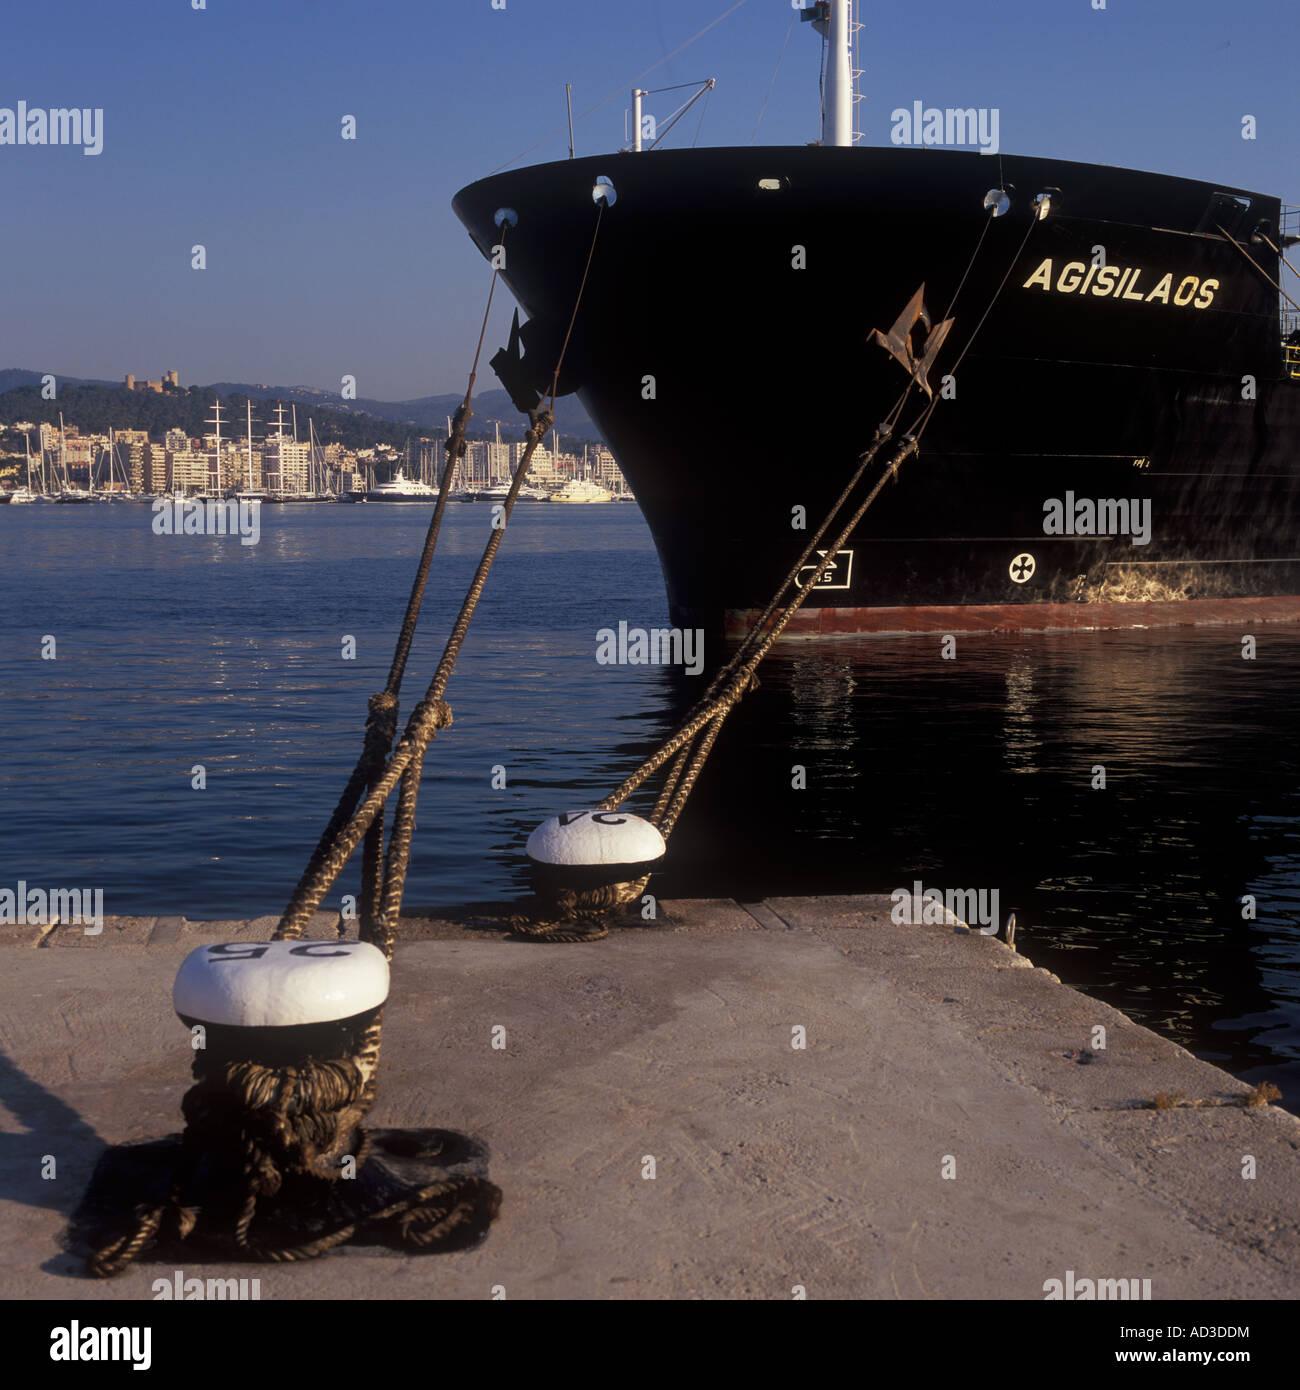 "Early morning image of Petroleum Product Carrier ""AGISLAOS"" discharging cargo, Port of Palma de Mallorca. Stock Photo"